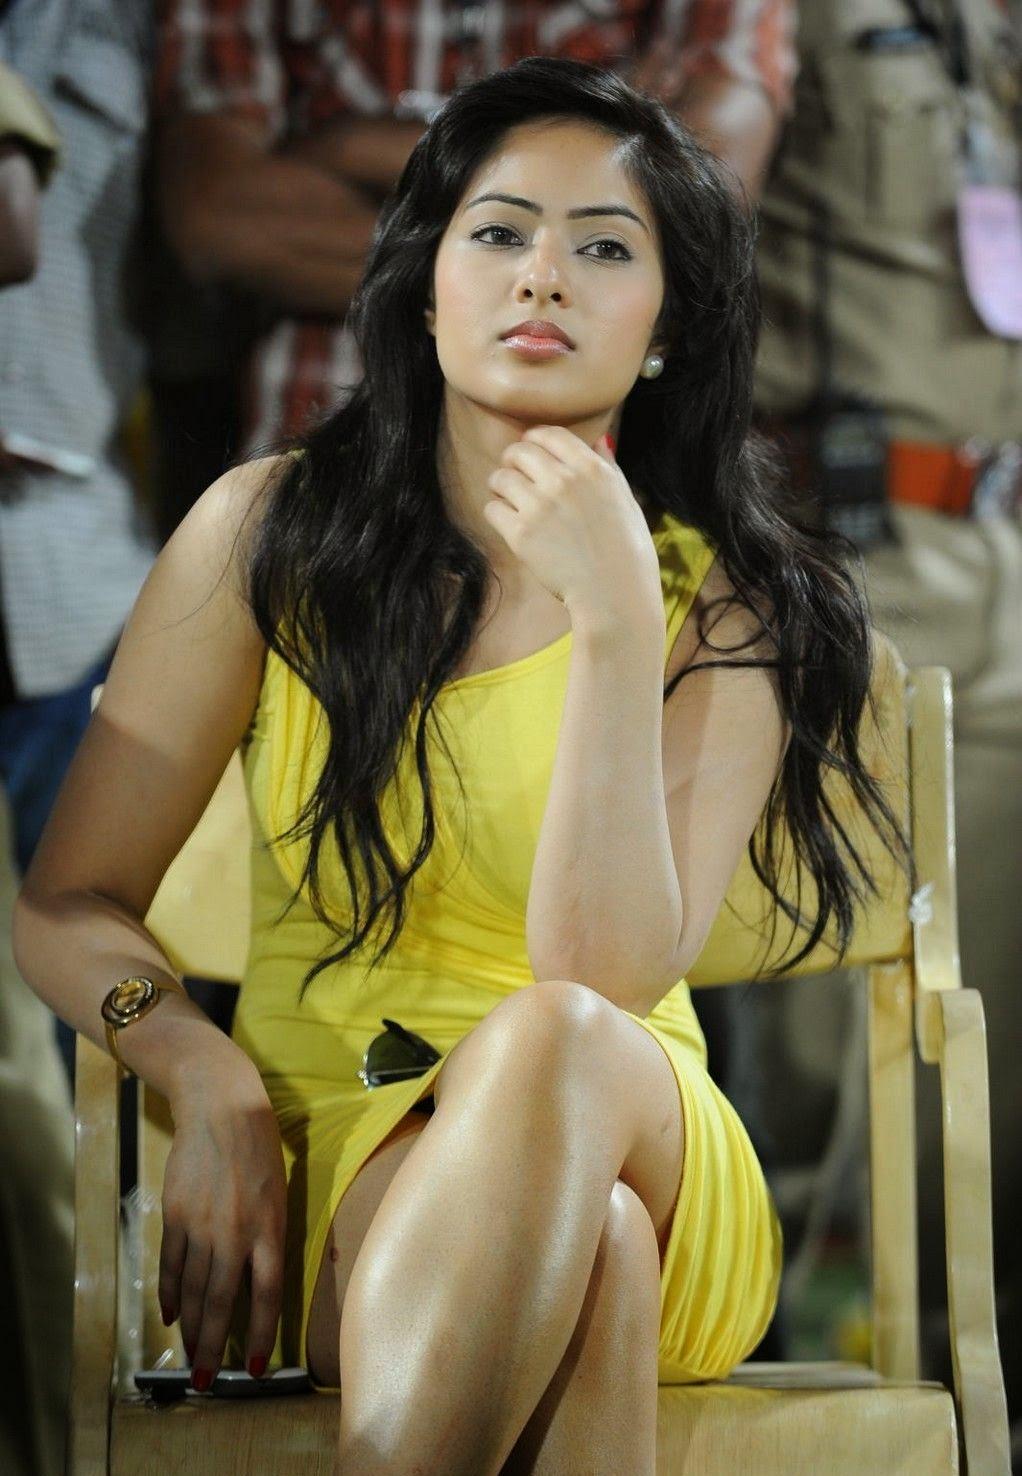 Xxx sexy cricketer girl pic korea lesbaine